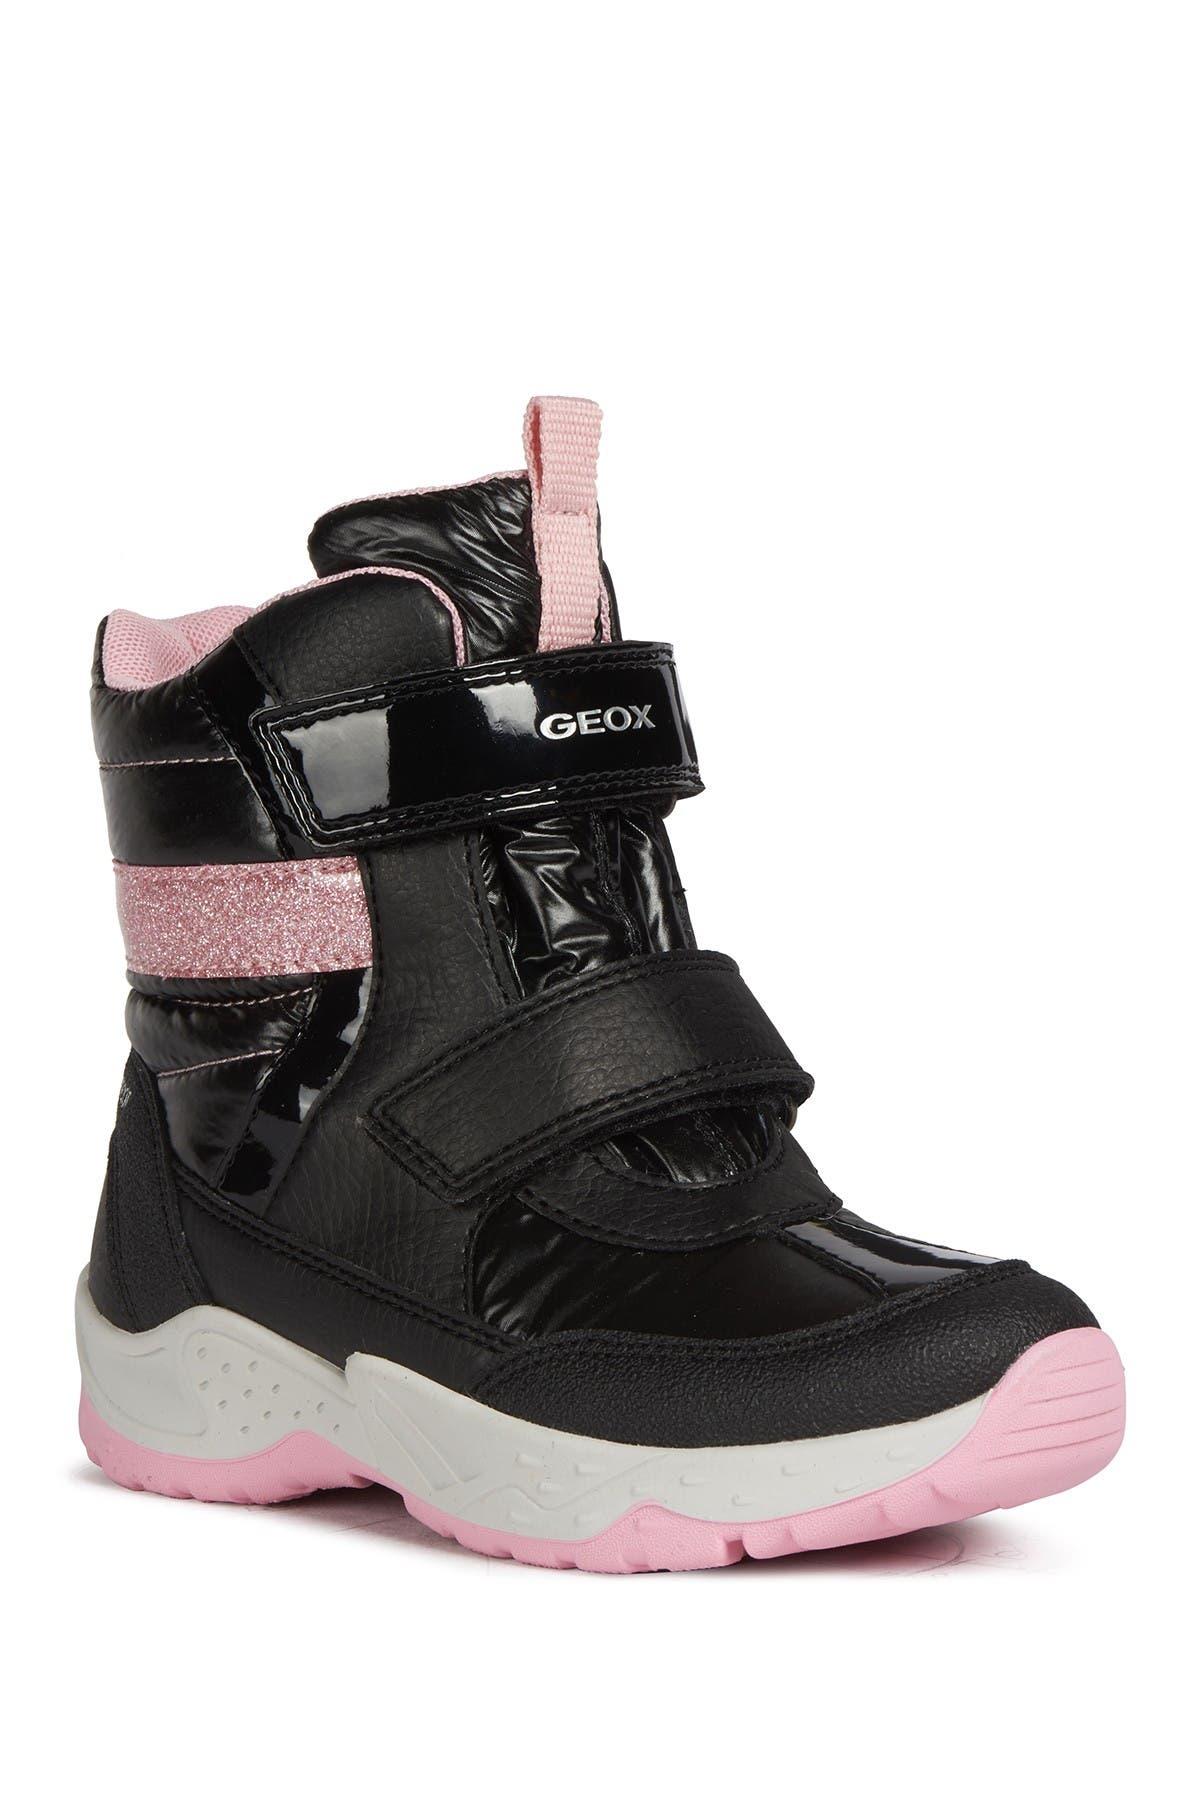 GEOX Sentiero Girl WP Boot